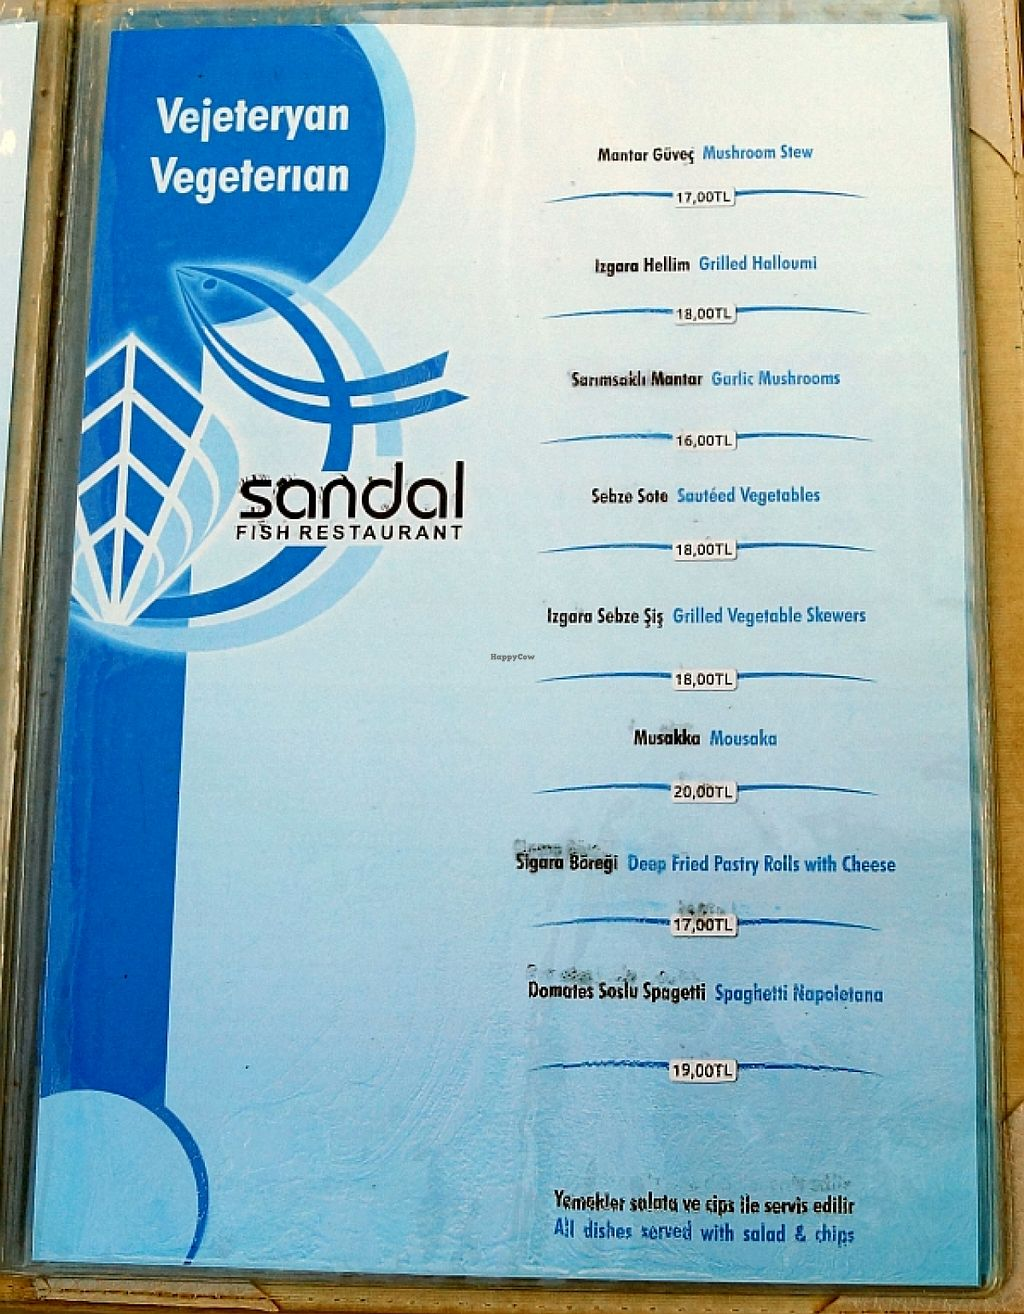 "Photo of Sandal  by <a href=""/members/profile/danielpoland"">danielpoland</a> <br/>Vegetarian menu <br/> August 17, 2015  - <a href='/contact/abuse/image/62091/113933'>Report</a>"